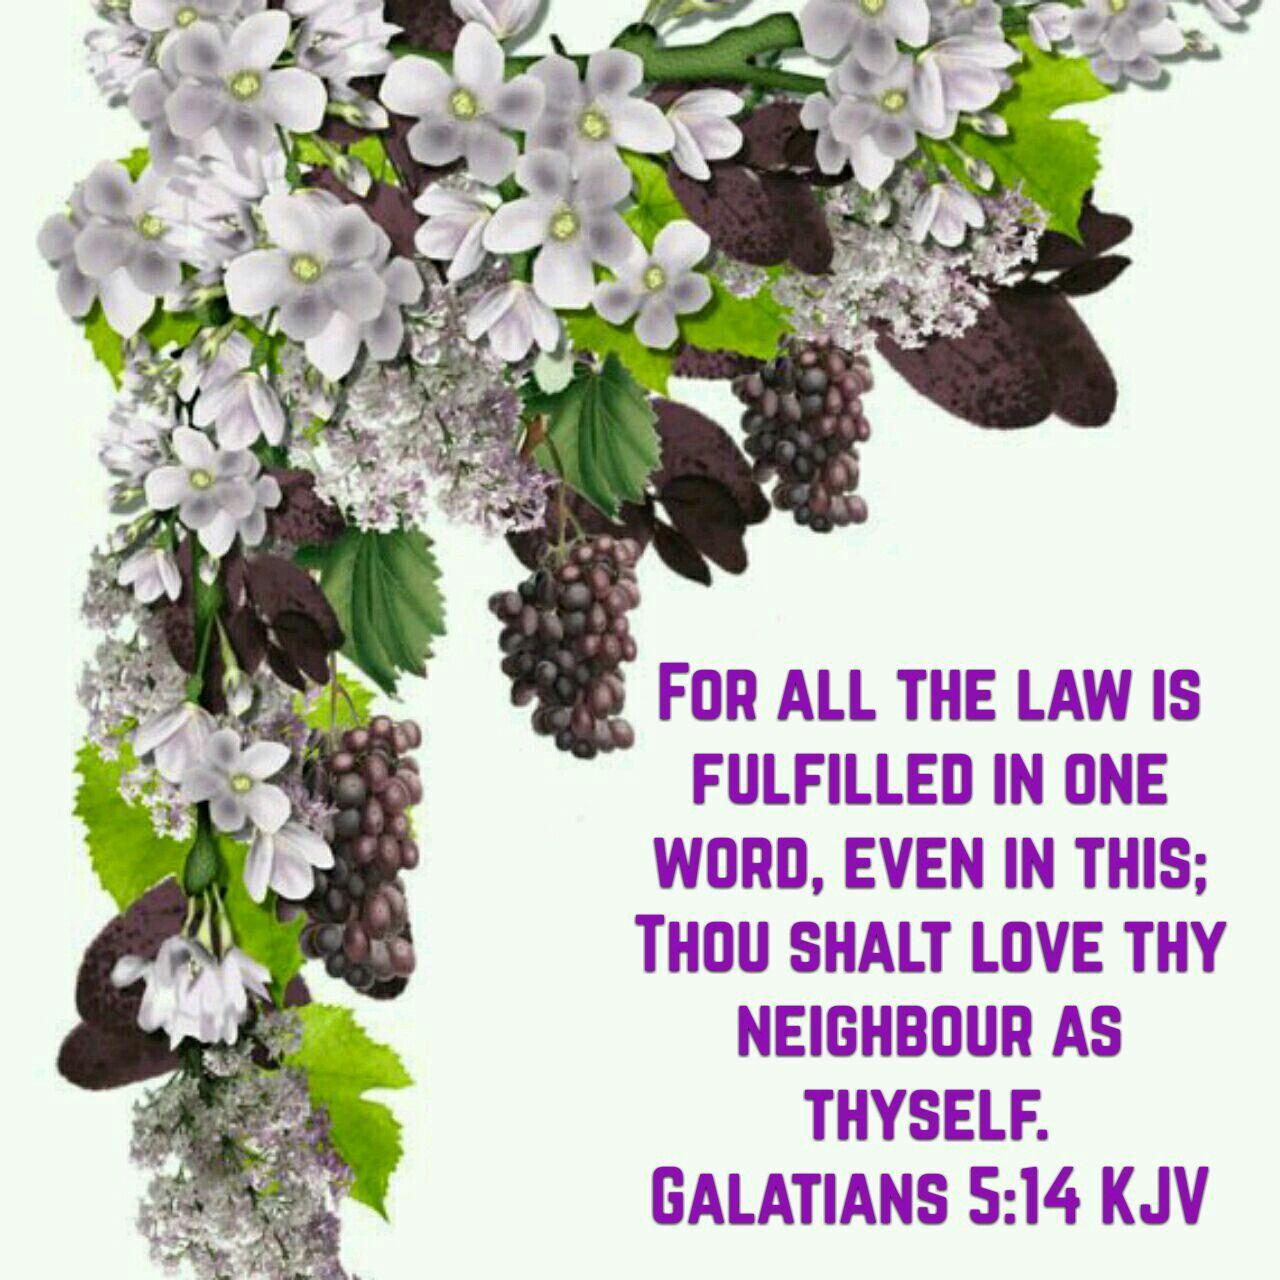 Salatians 5:14 quote